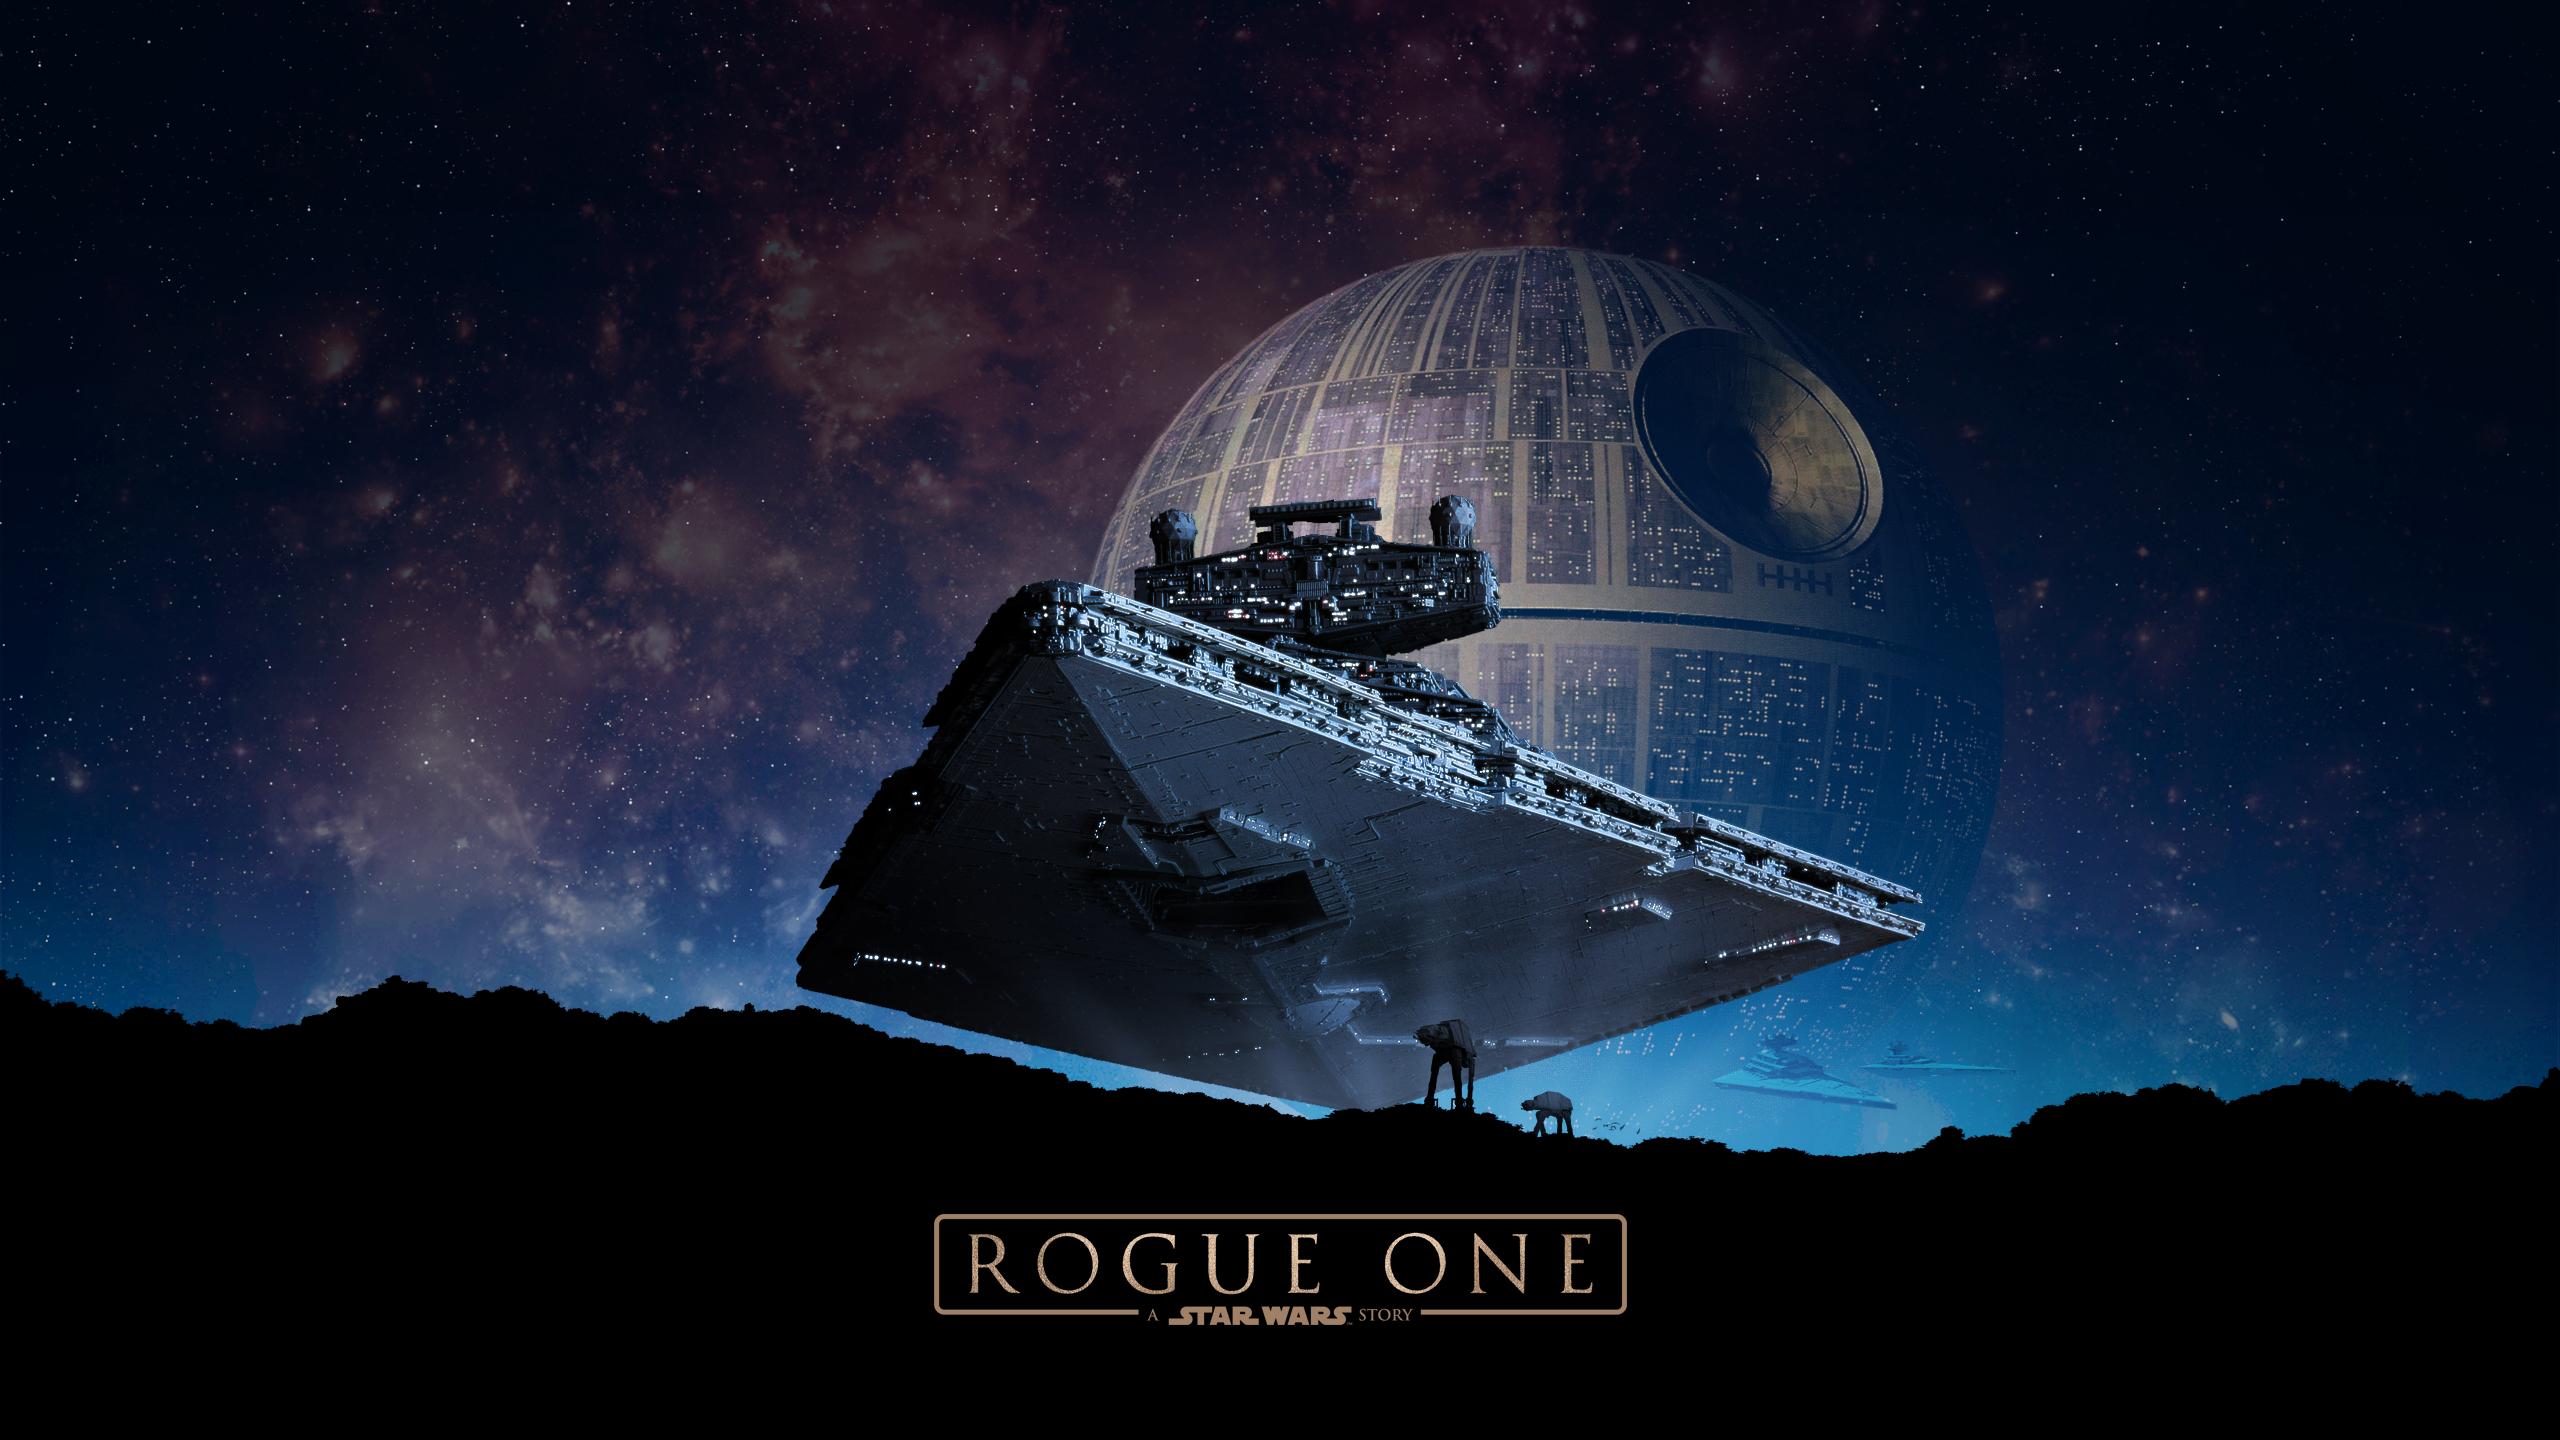 Star Wars Rogue One Wallpaper By Rocklou On Deviantart